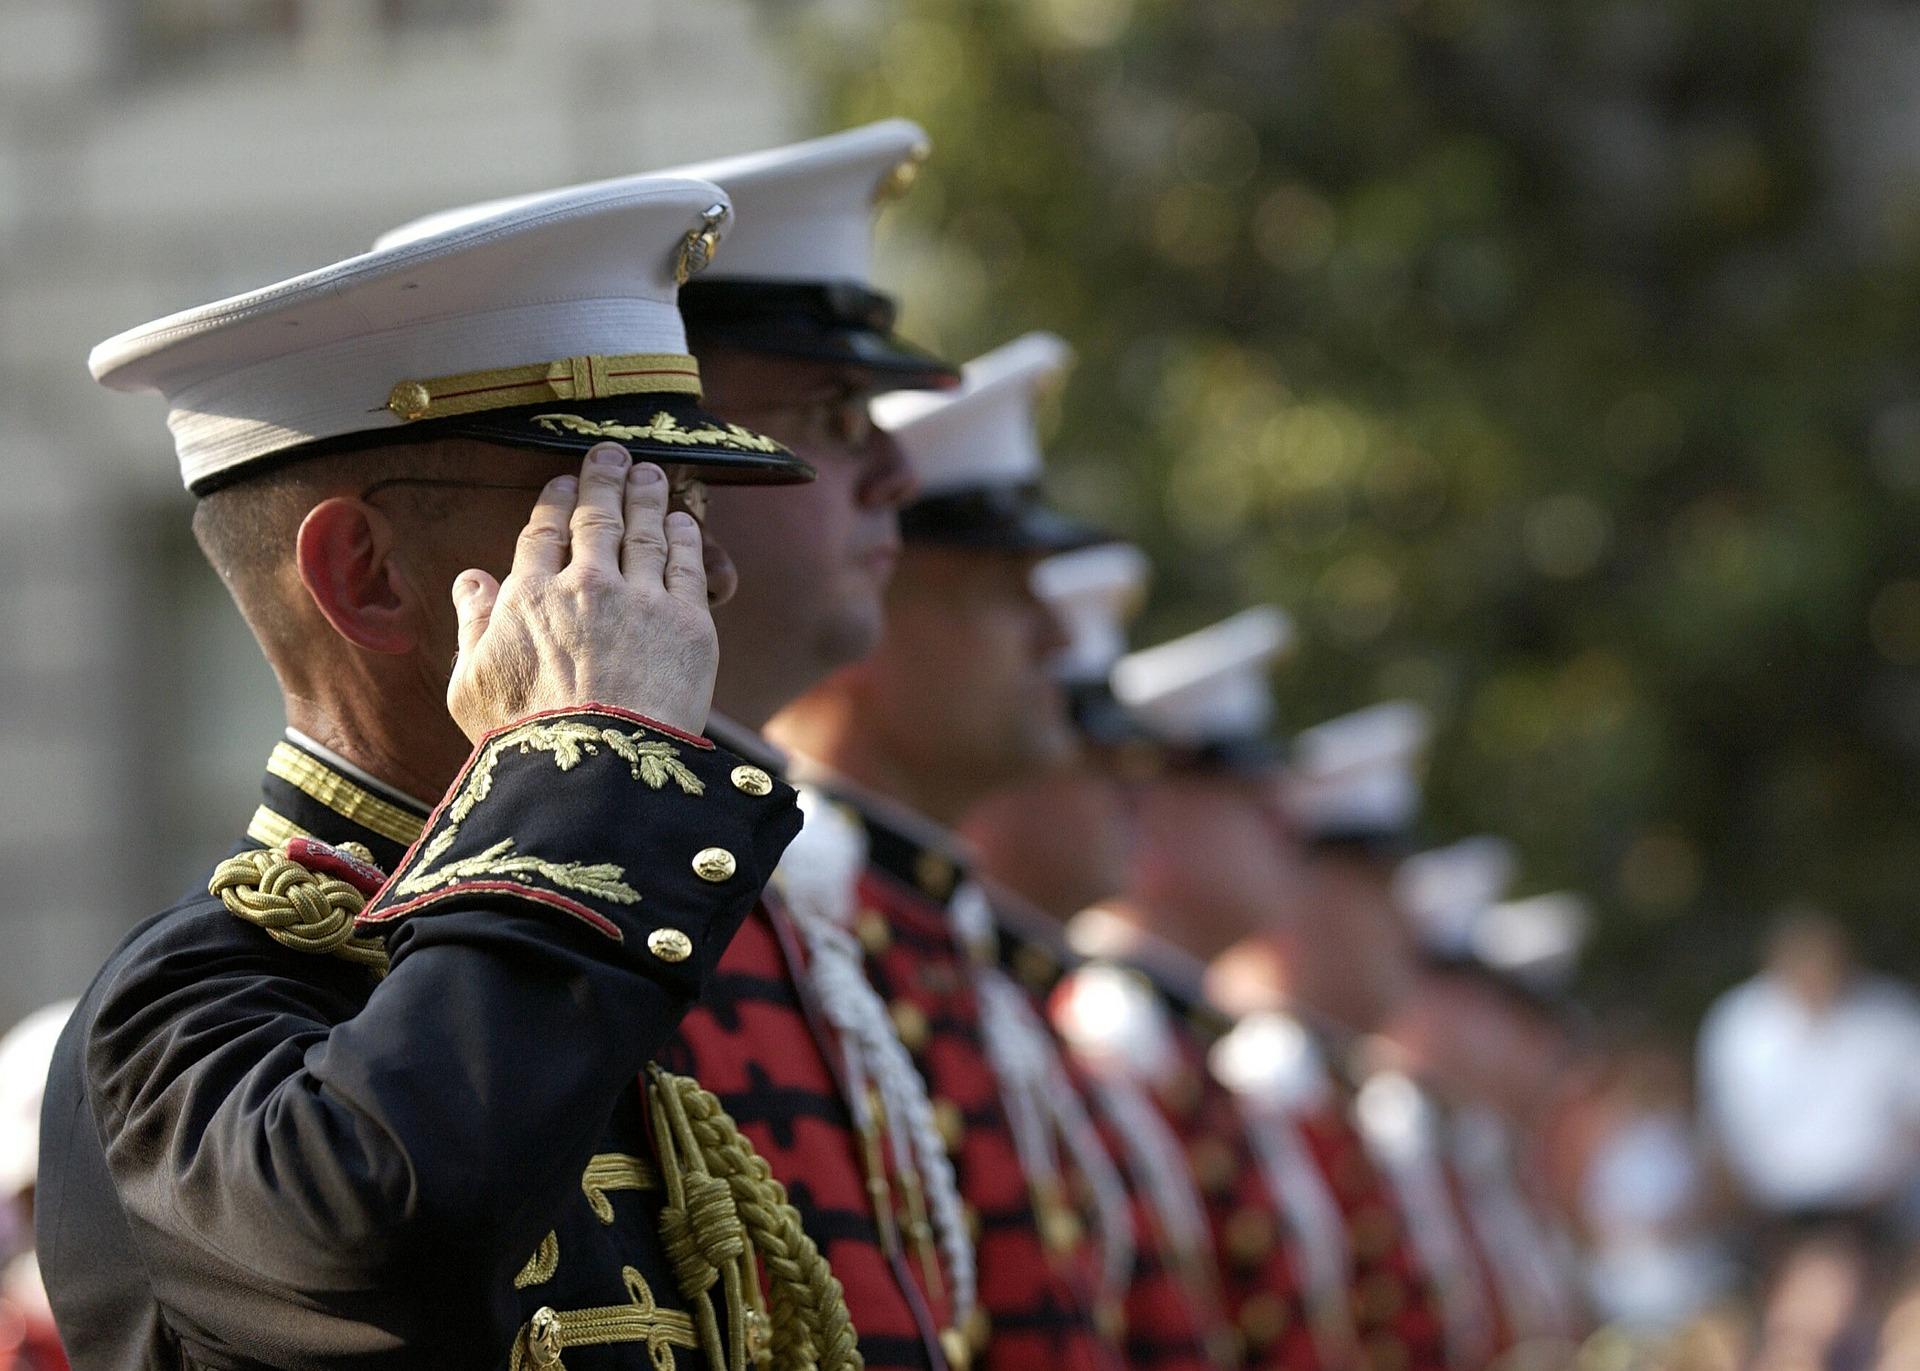 incontri giacche militari testo a buon mercato dating UK